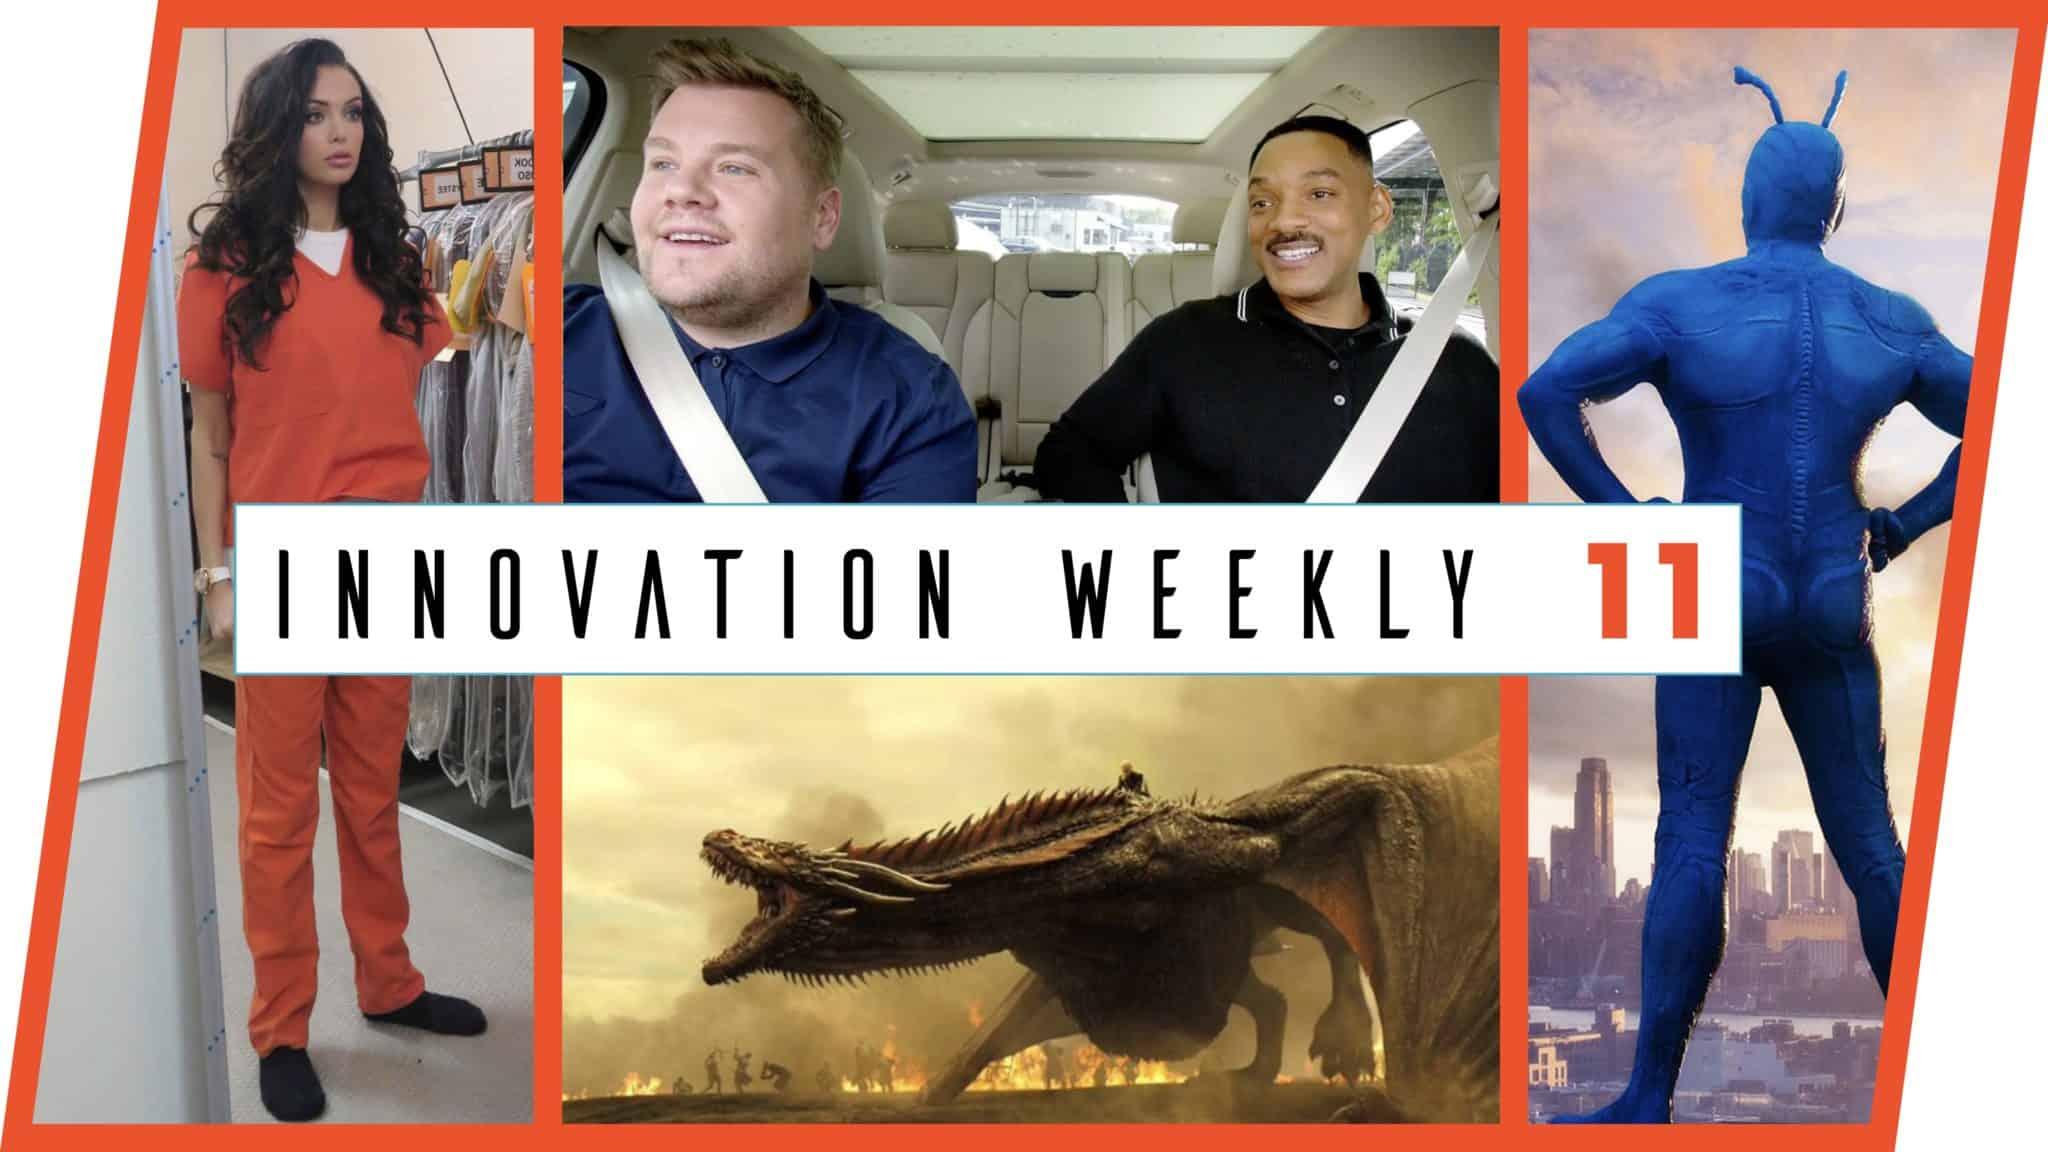 innovation weekly 11.001